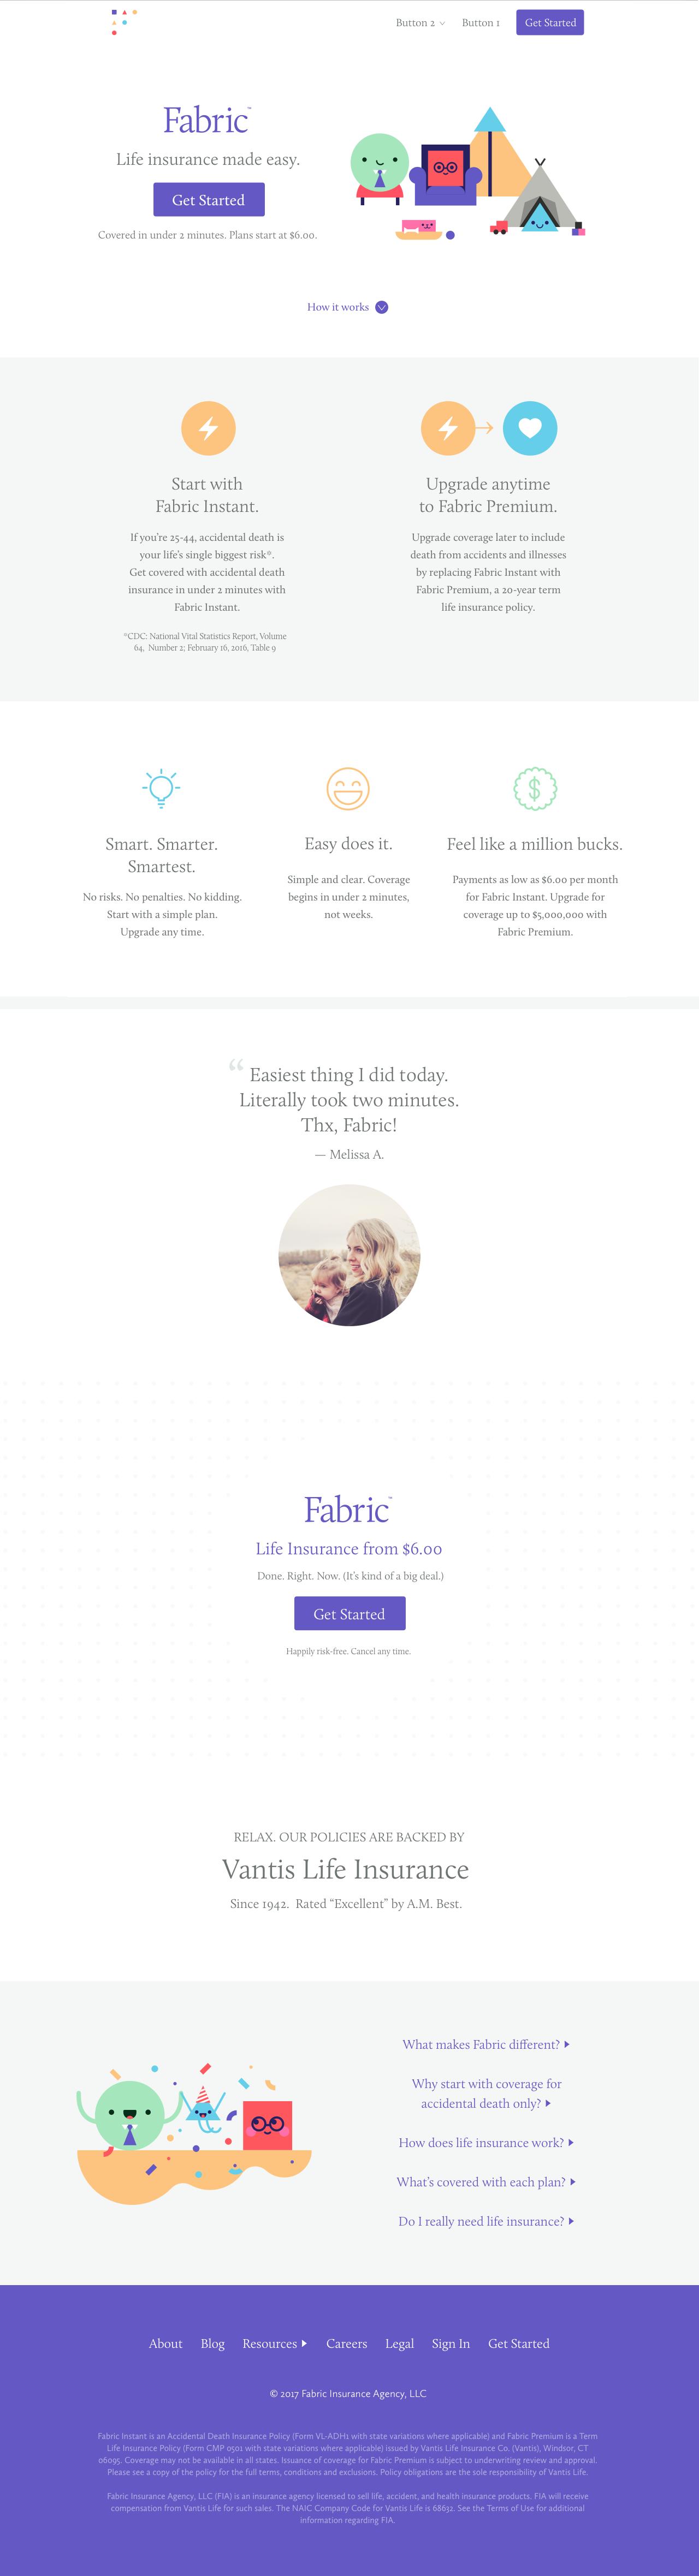 Fabric homepage original